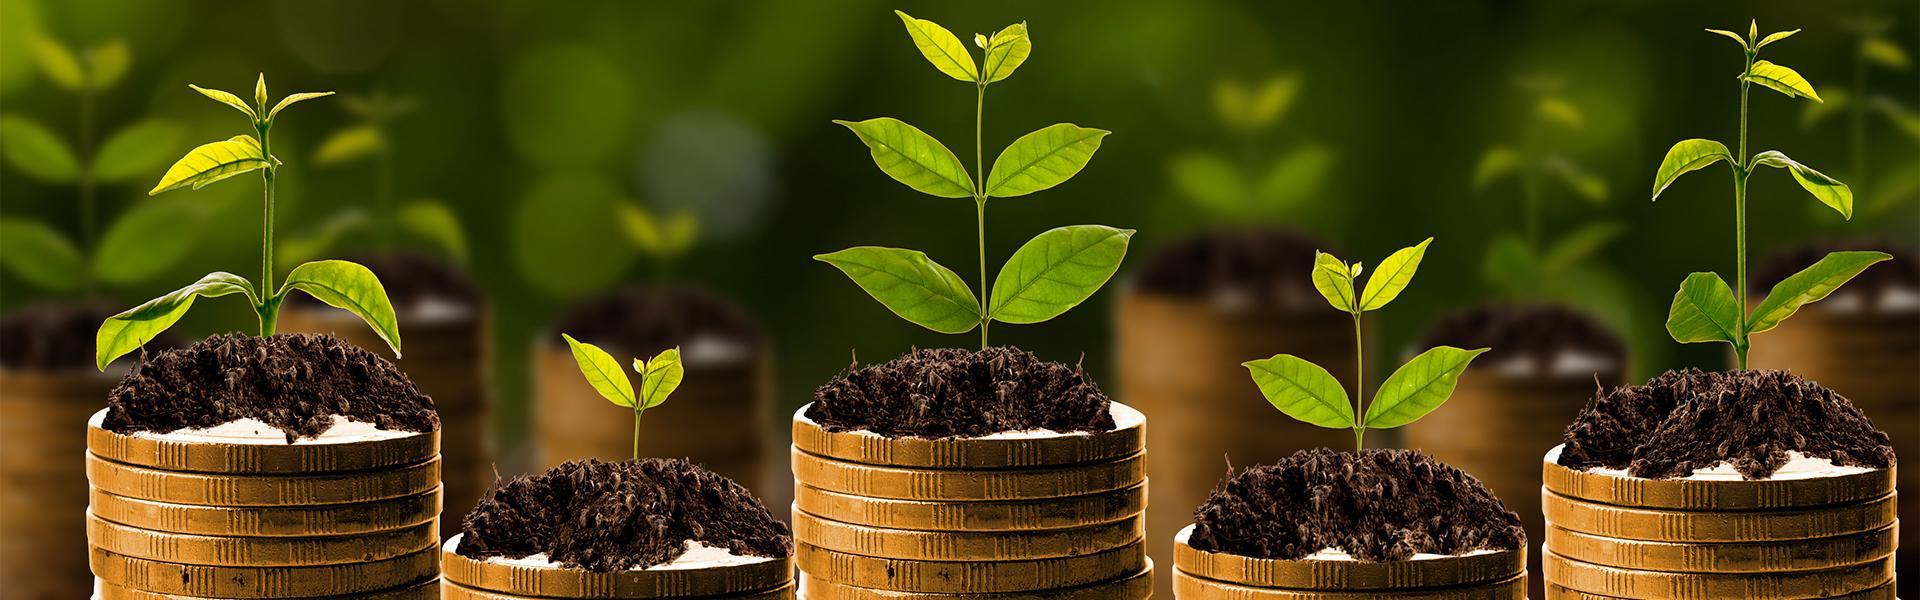 Monetary growth